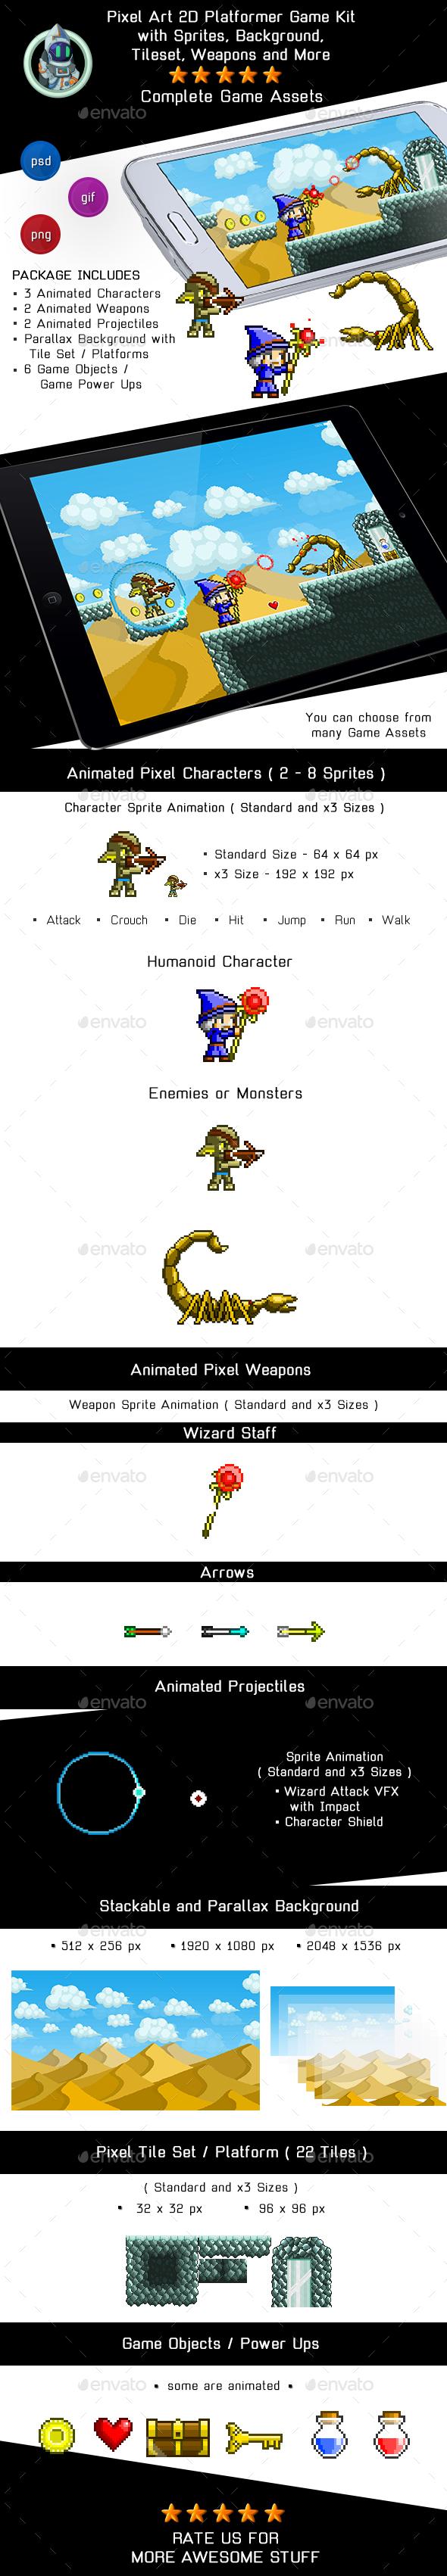 Game Assets Pixel Platformer Kit - Sprites, Background and Weapons - Game Kits Game Assets